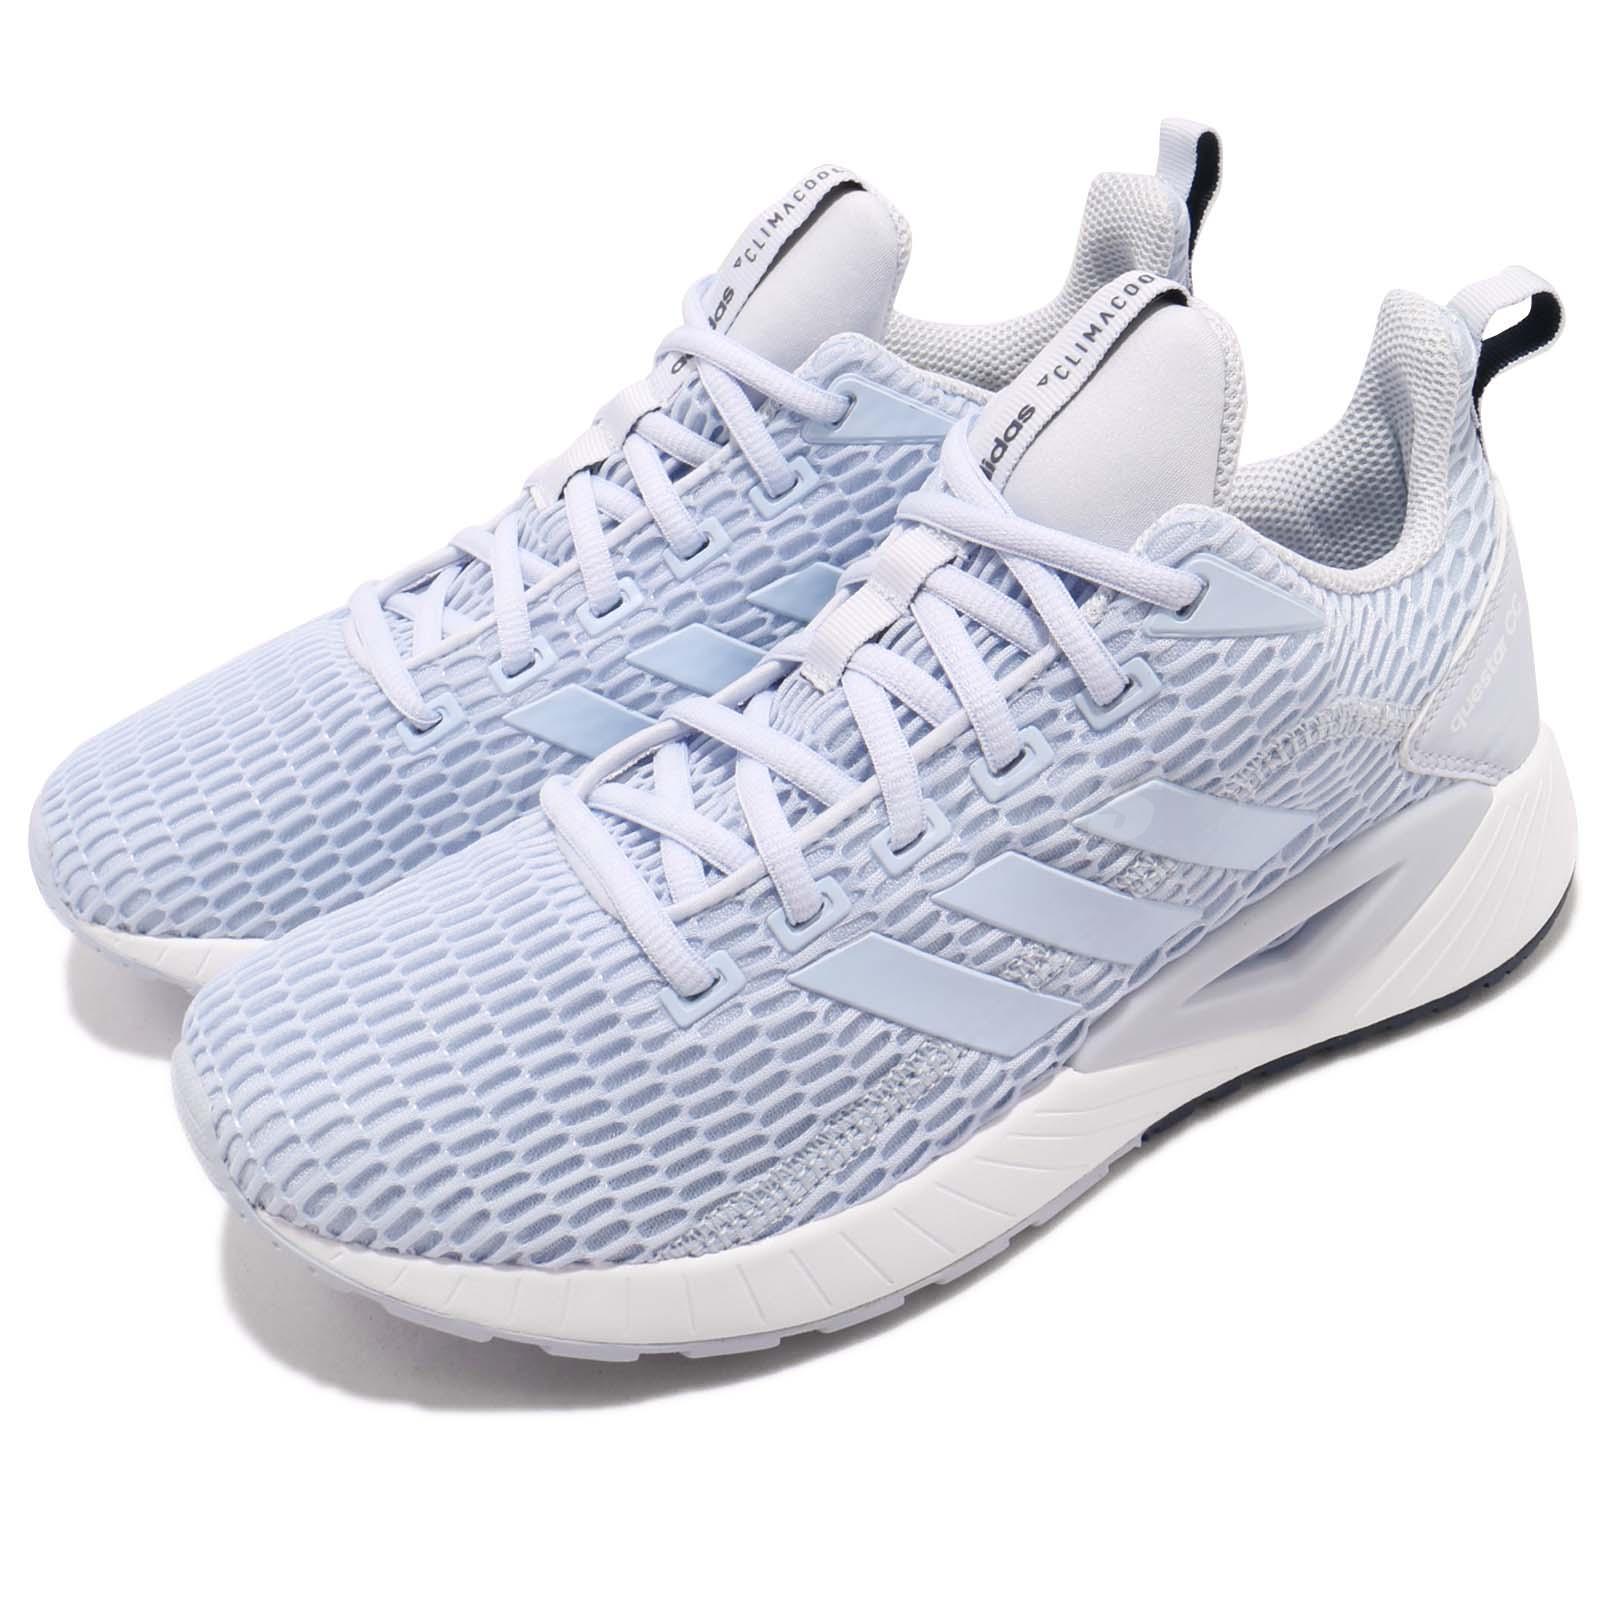 best sneakers 3d7d0 a99d1 Details about adidas Questar CC W Aero Blue Core Navy Women Running Shoes  Sneakers DB1304